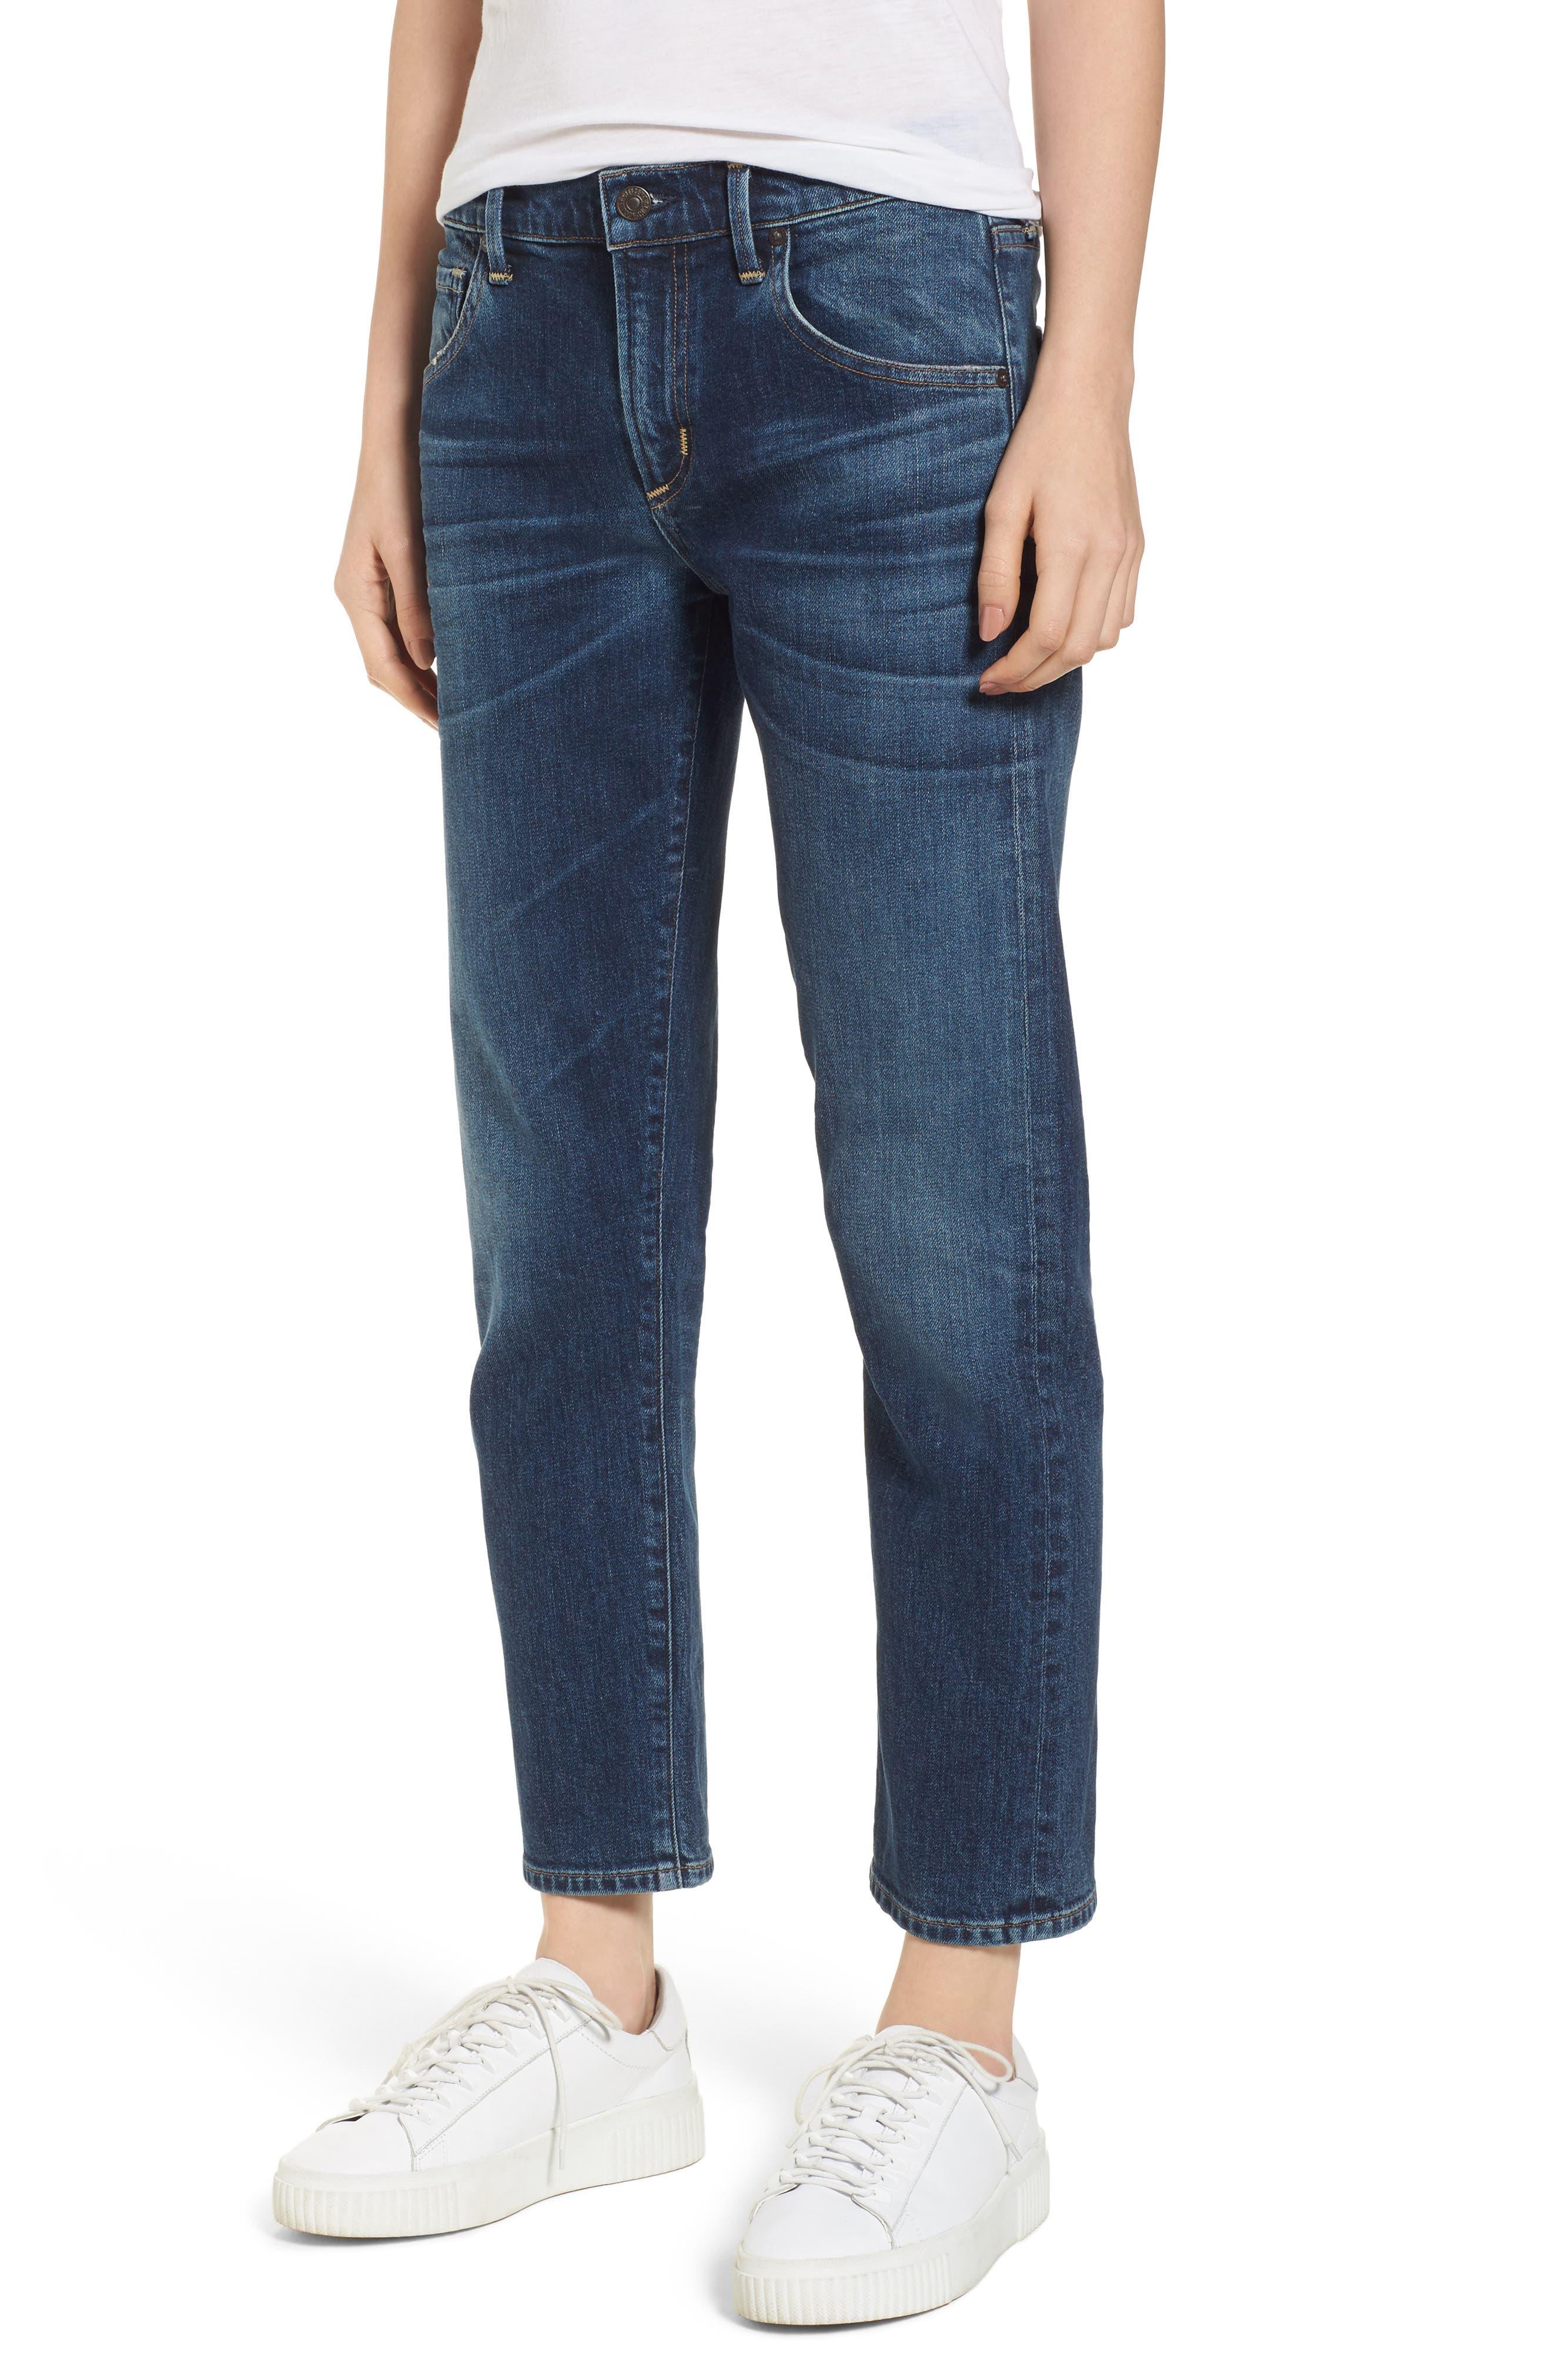 Emerson Slim Boyfriend Jeans,                         Main,                         color, New Moon